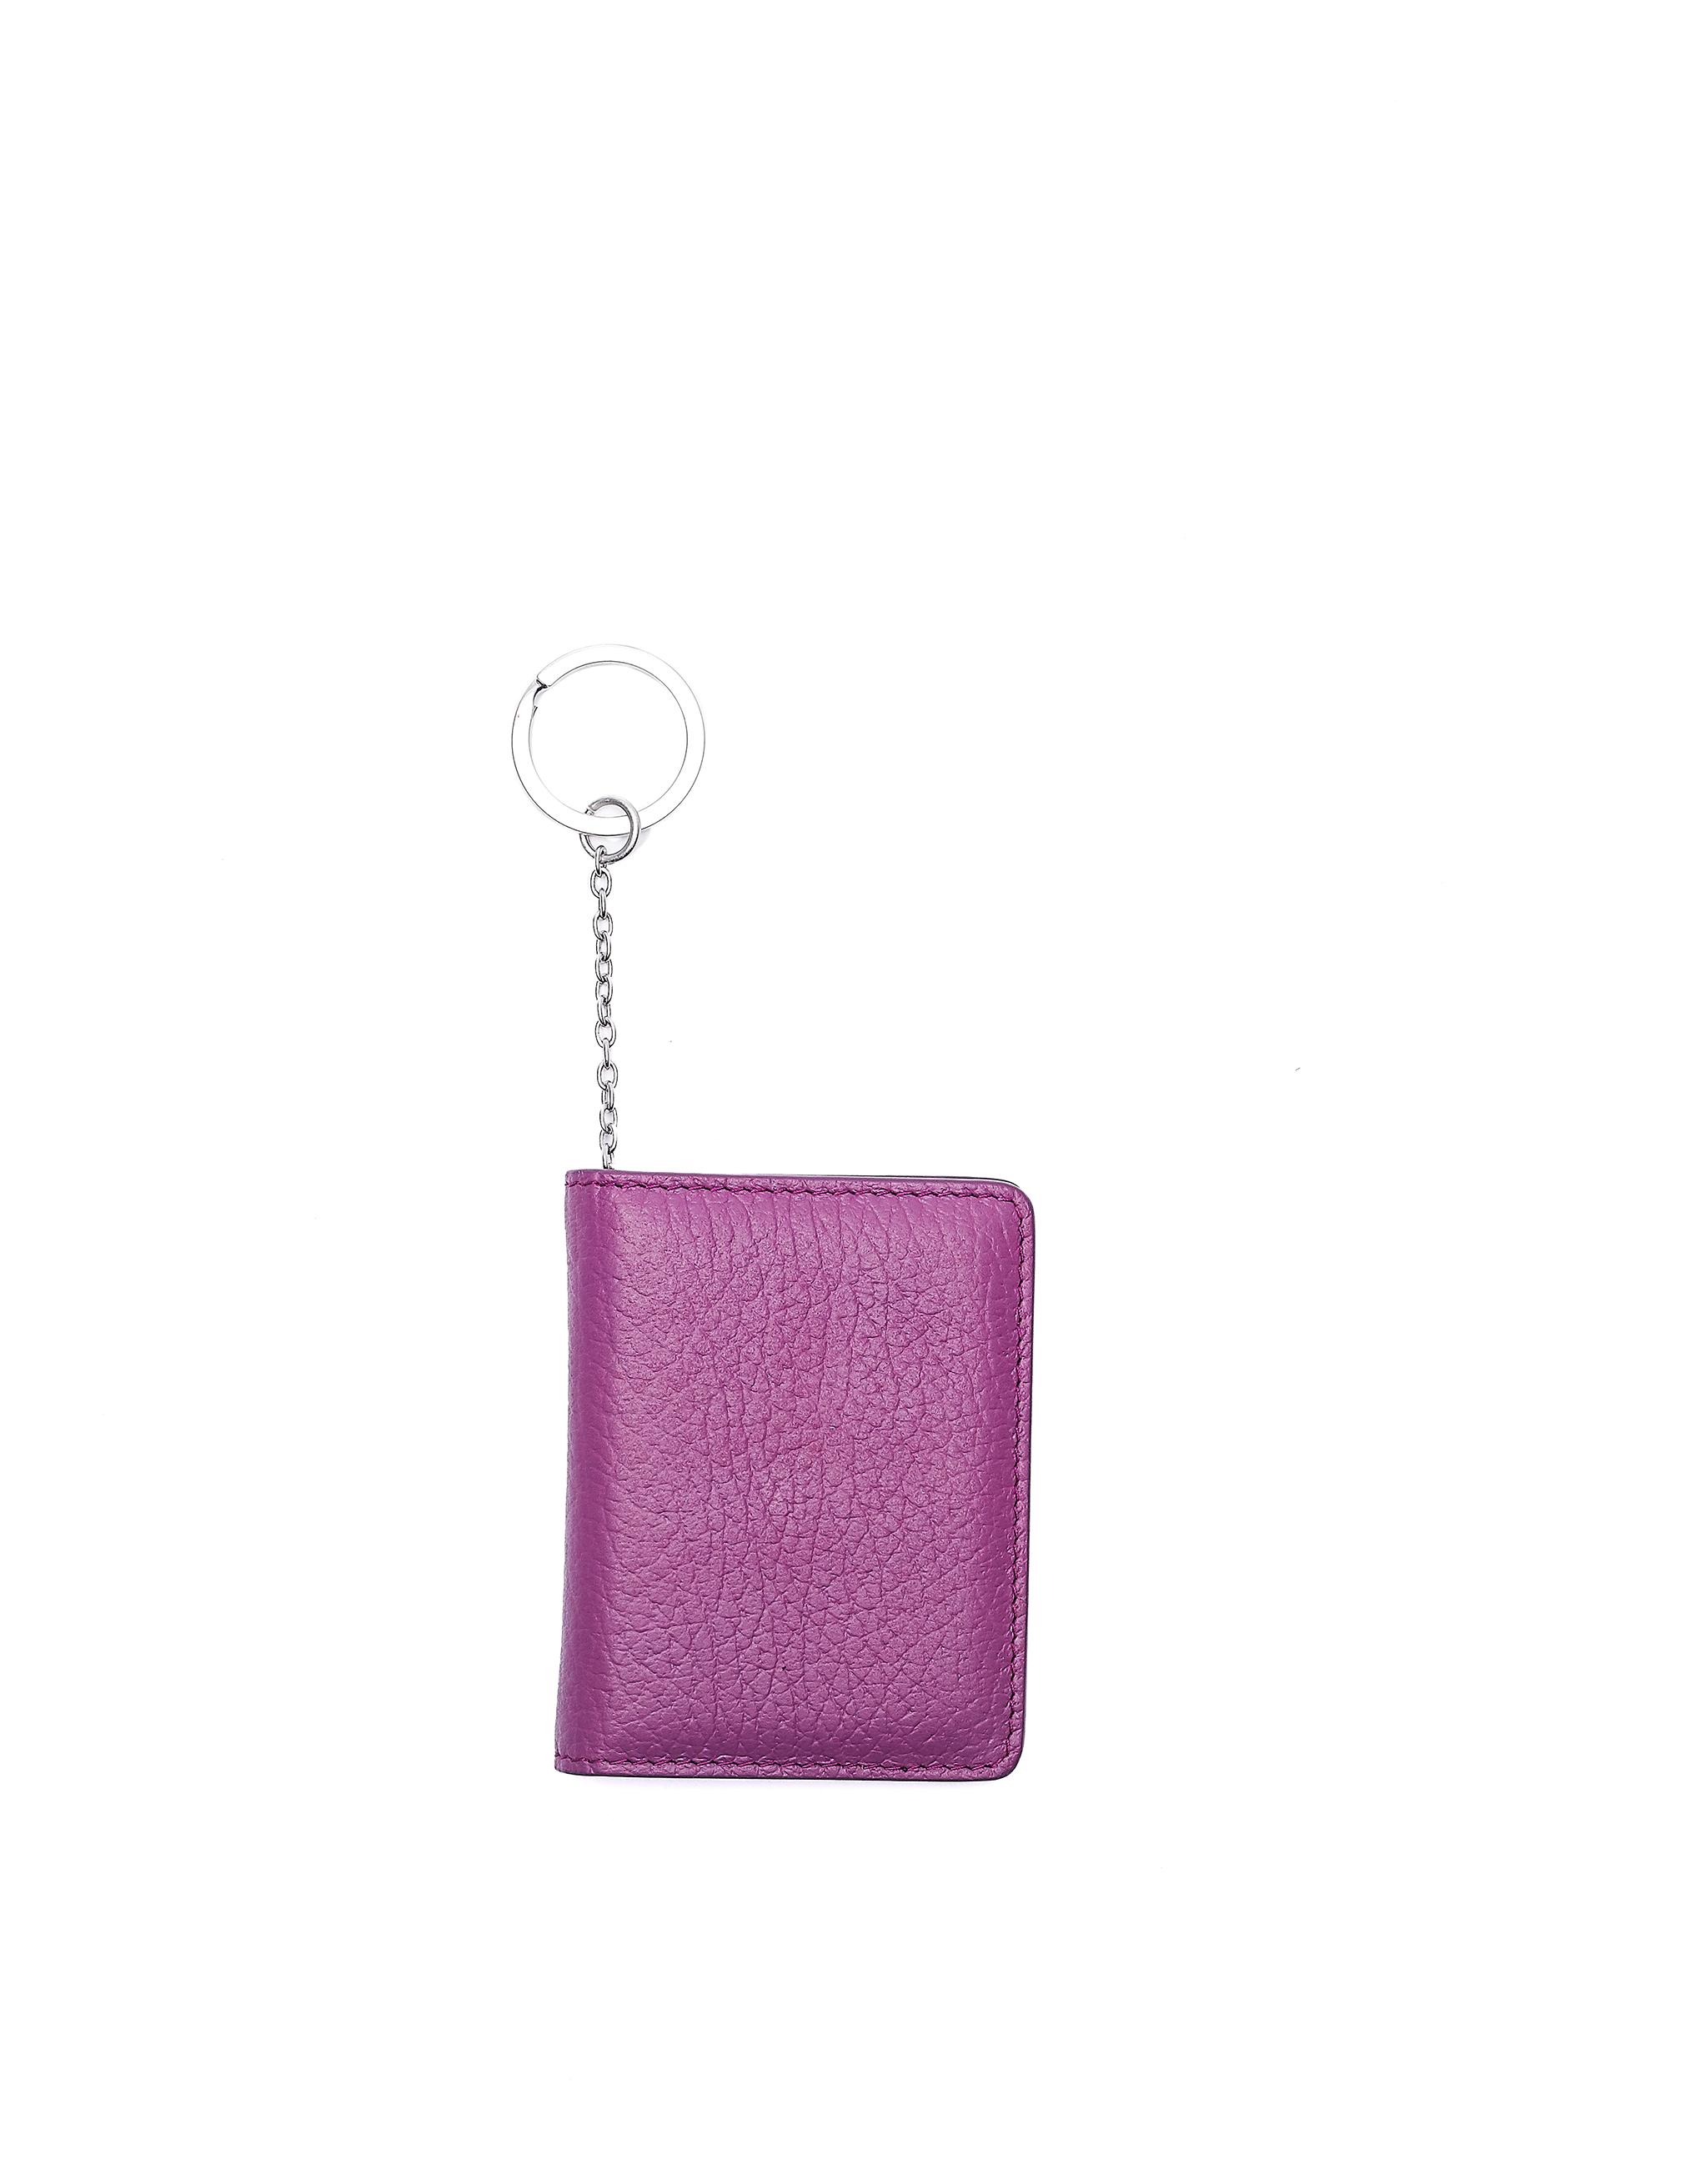 Maison Margiela Purple Leather Wallet